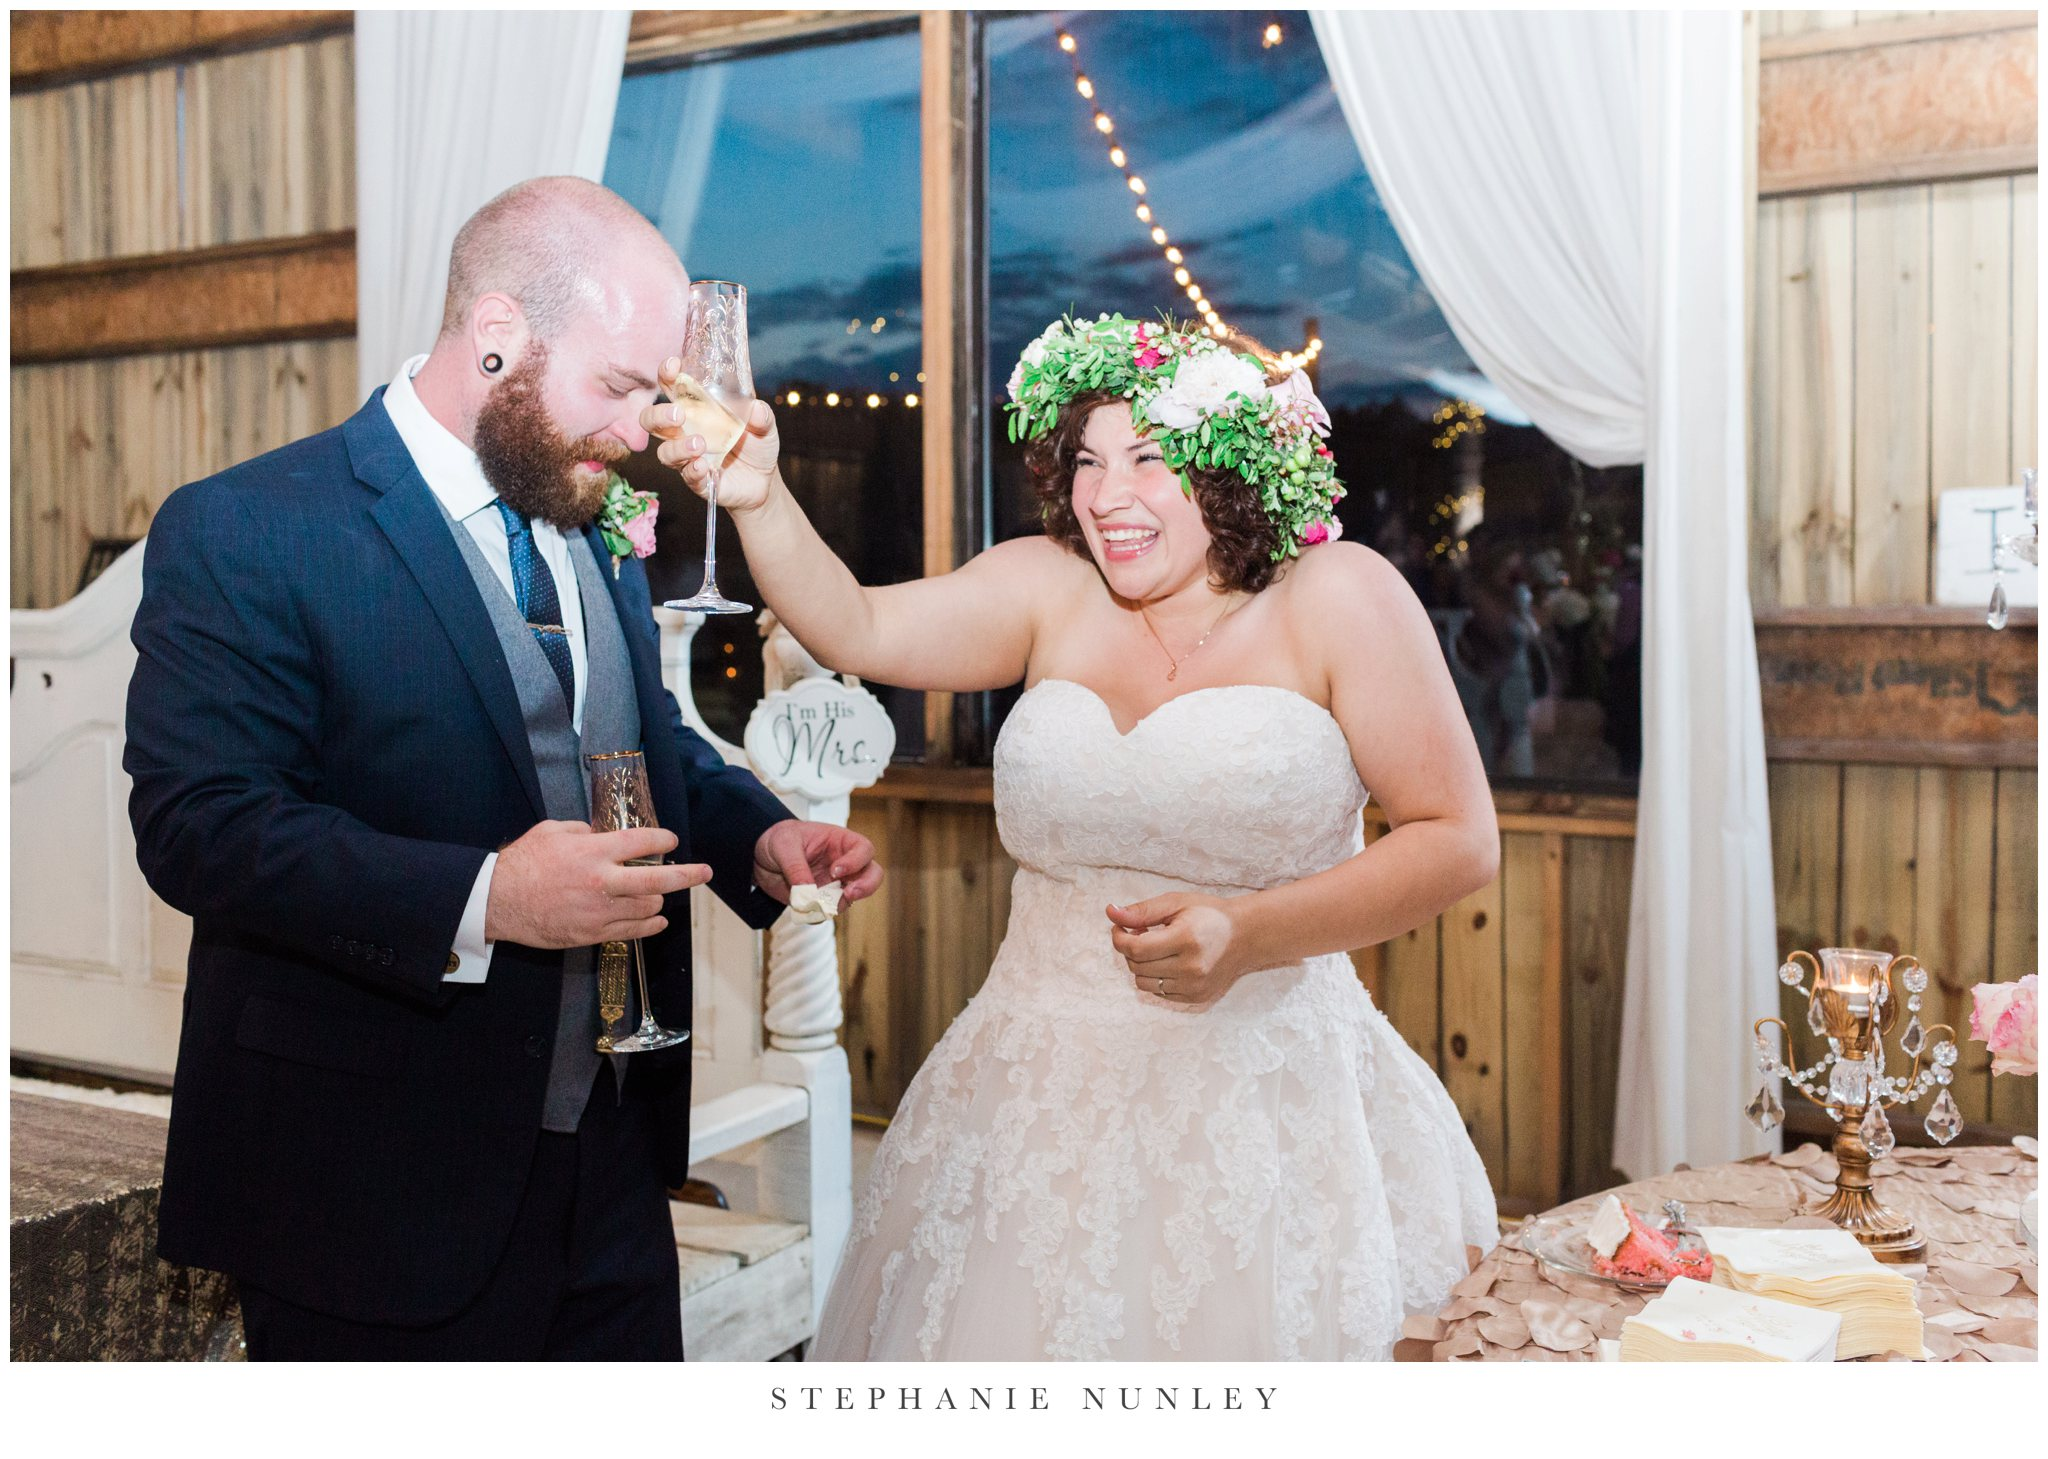 romantic-outdoor-wedding-with-flower-crown-0143.jpg